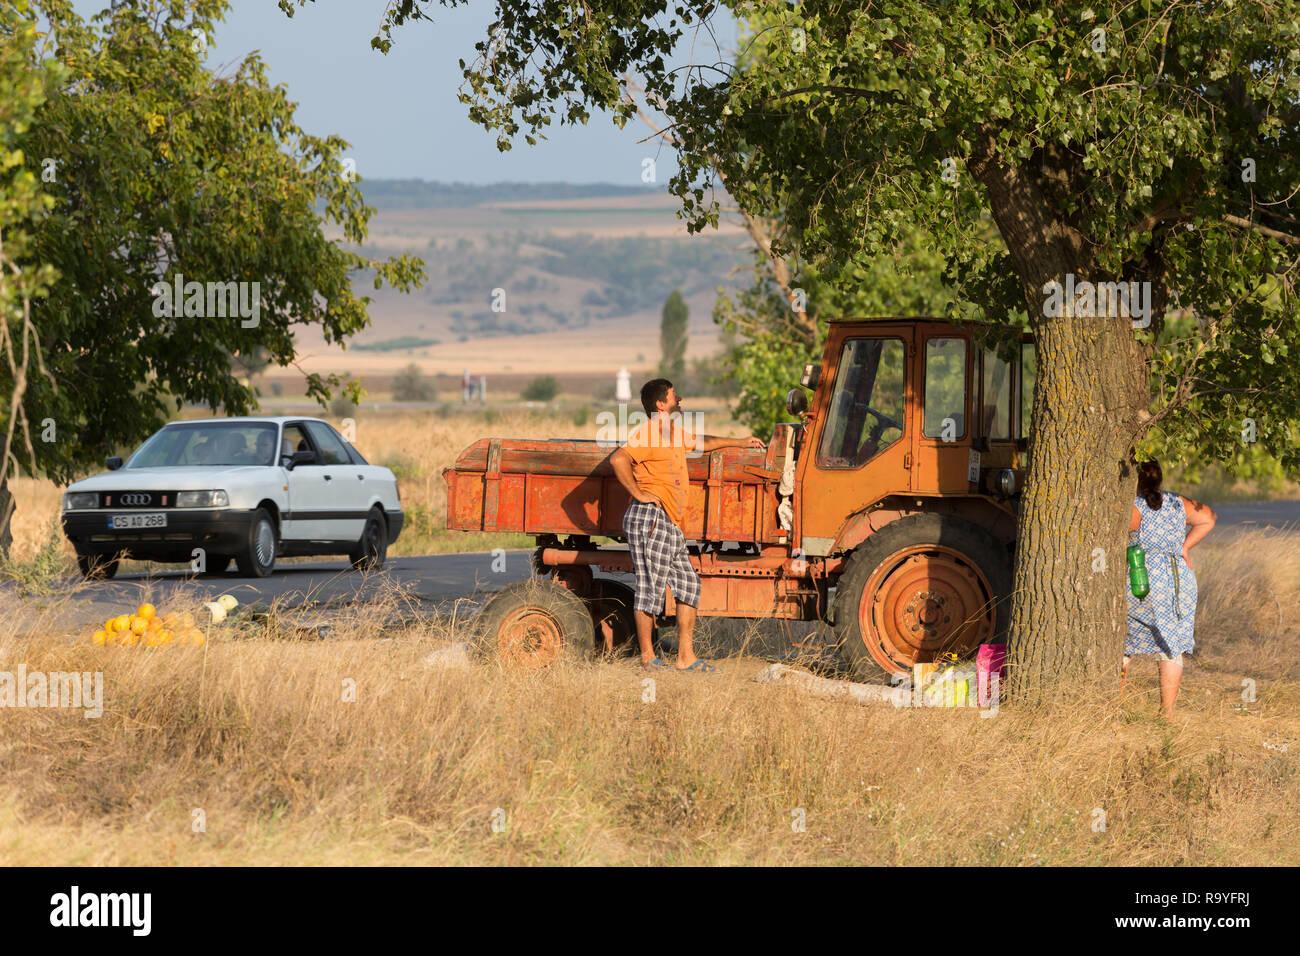 30.08.2016, Causeni, Rajon Causeni, Republik Moldau - Bauern verkaufen Melonen an der Landstrasse. 00A160830D463CARO.JPG [MODEL RELEASE: NO, PROPERTY  Stock Photo